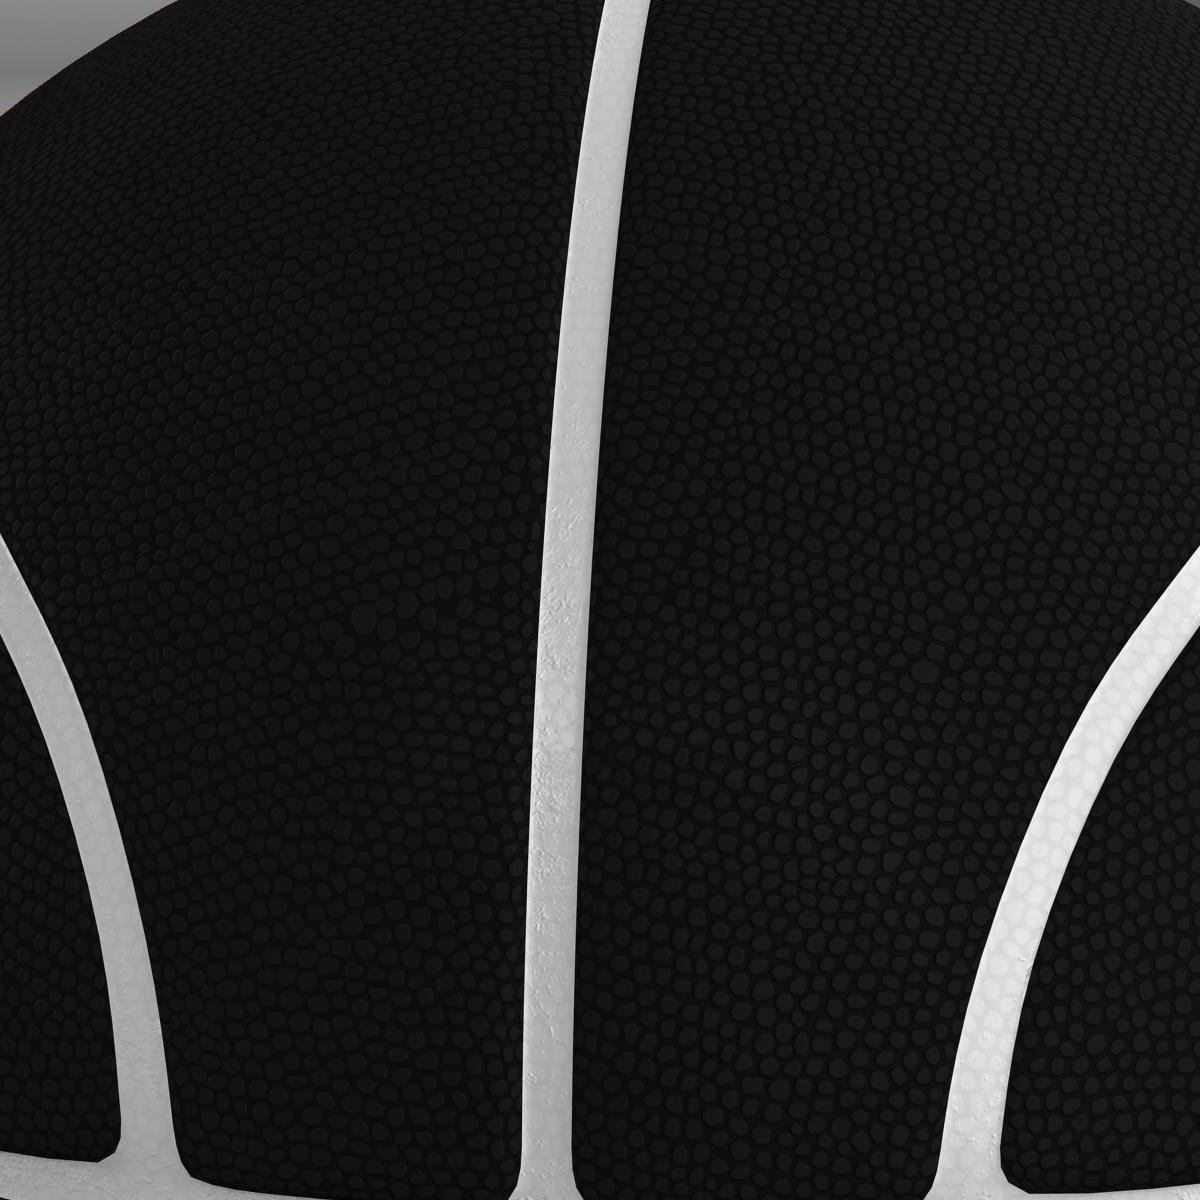 black basketball ball 3d model 3ds max fbx c4d ma mb obj 164935